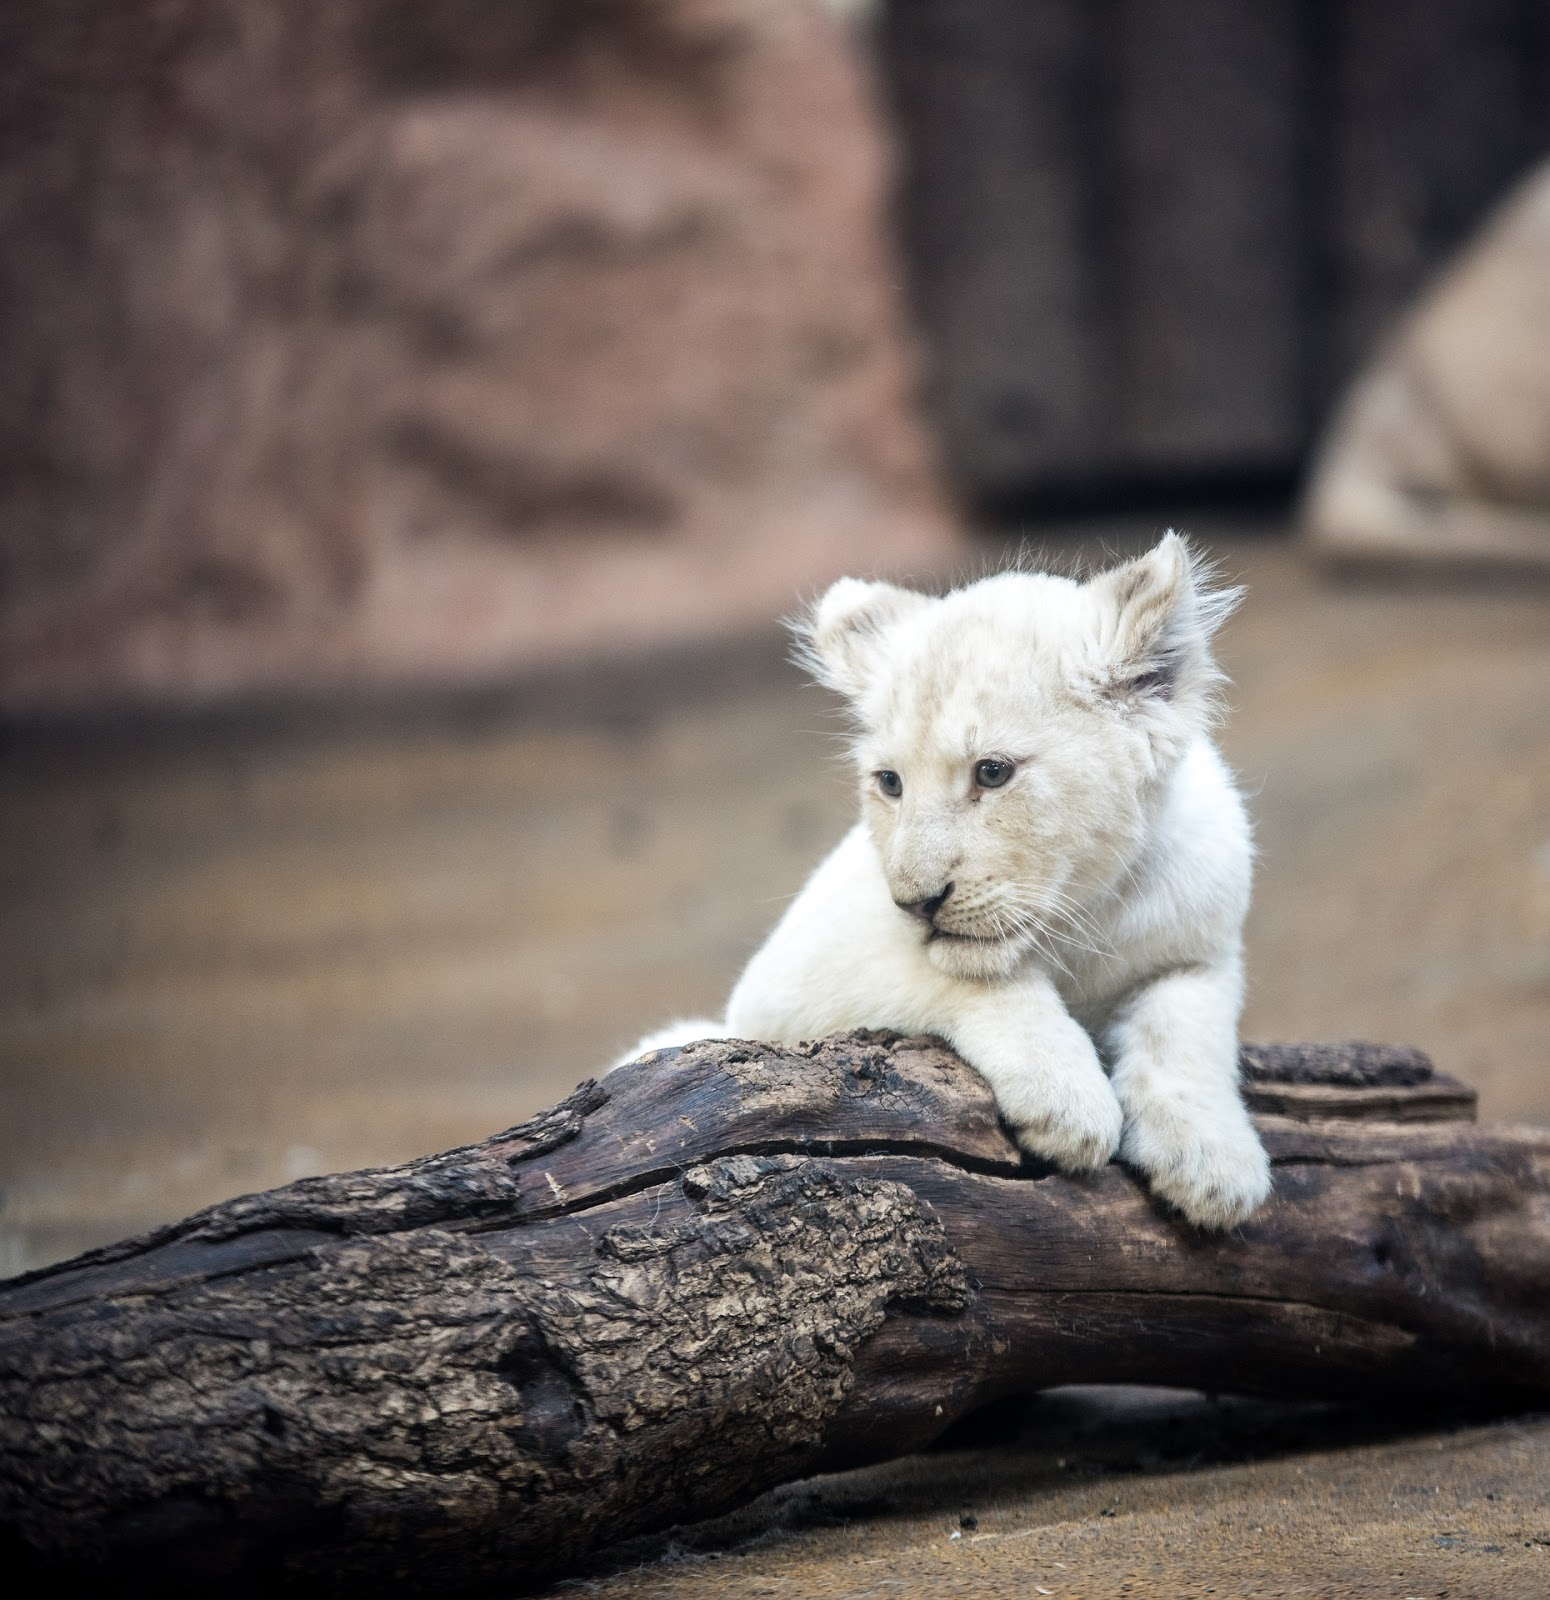 Lion White Lion Big Cat Mane Eyes Nature,lion images